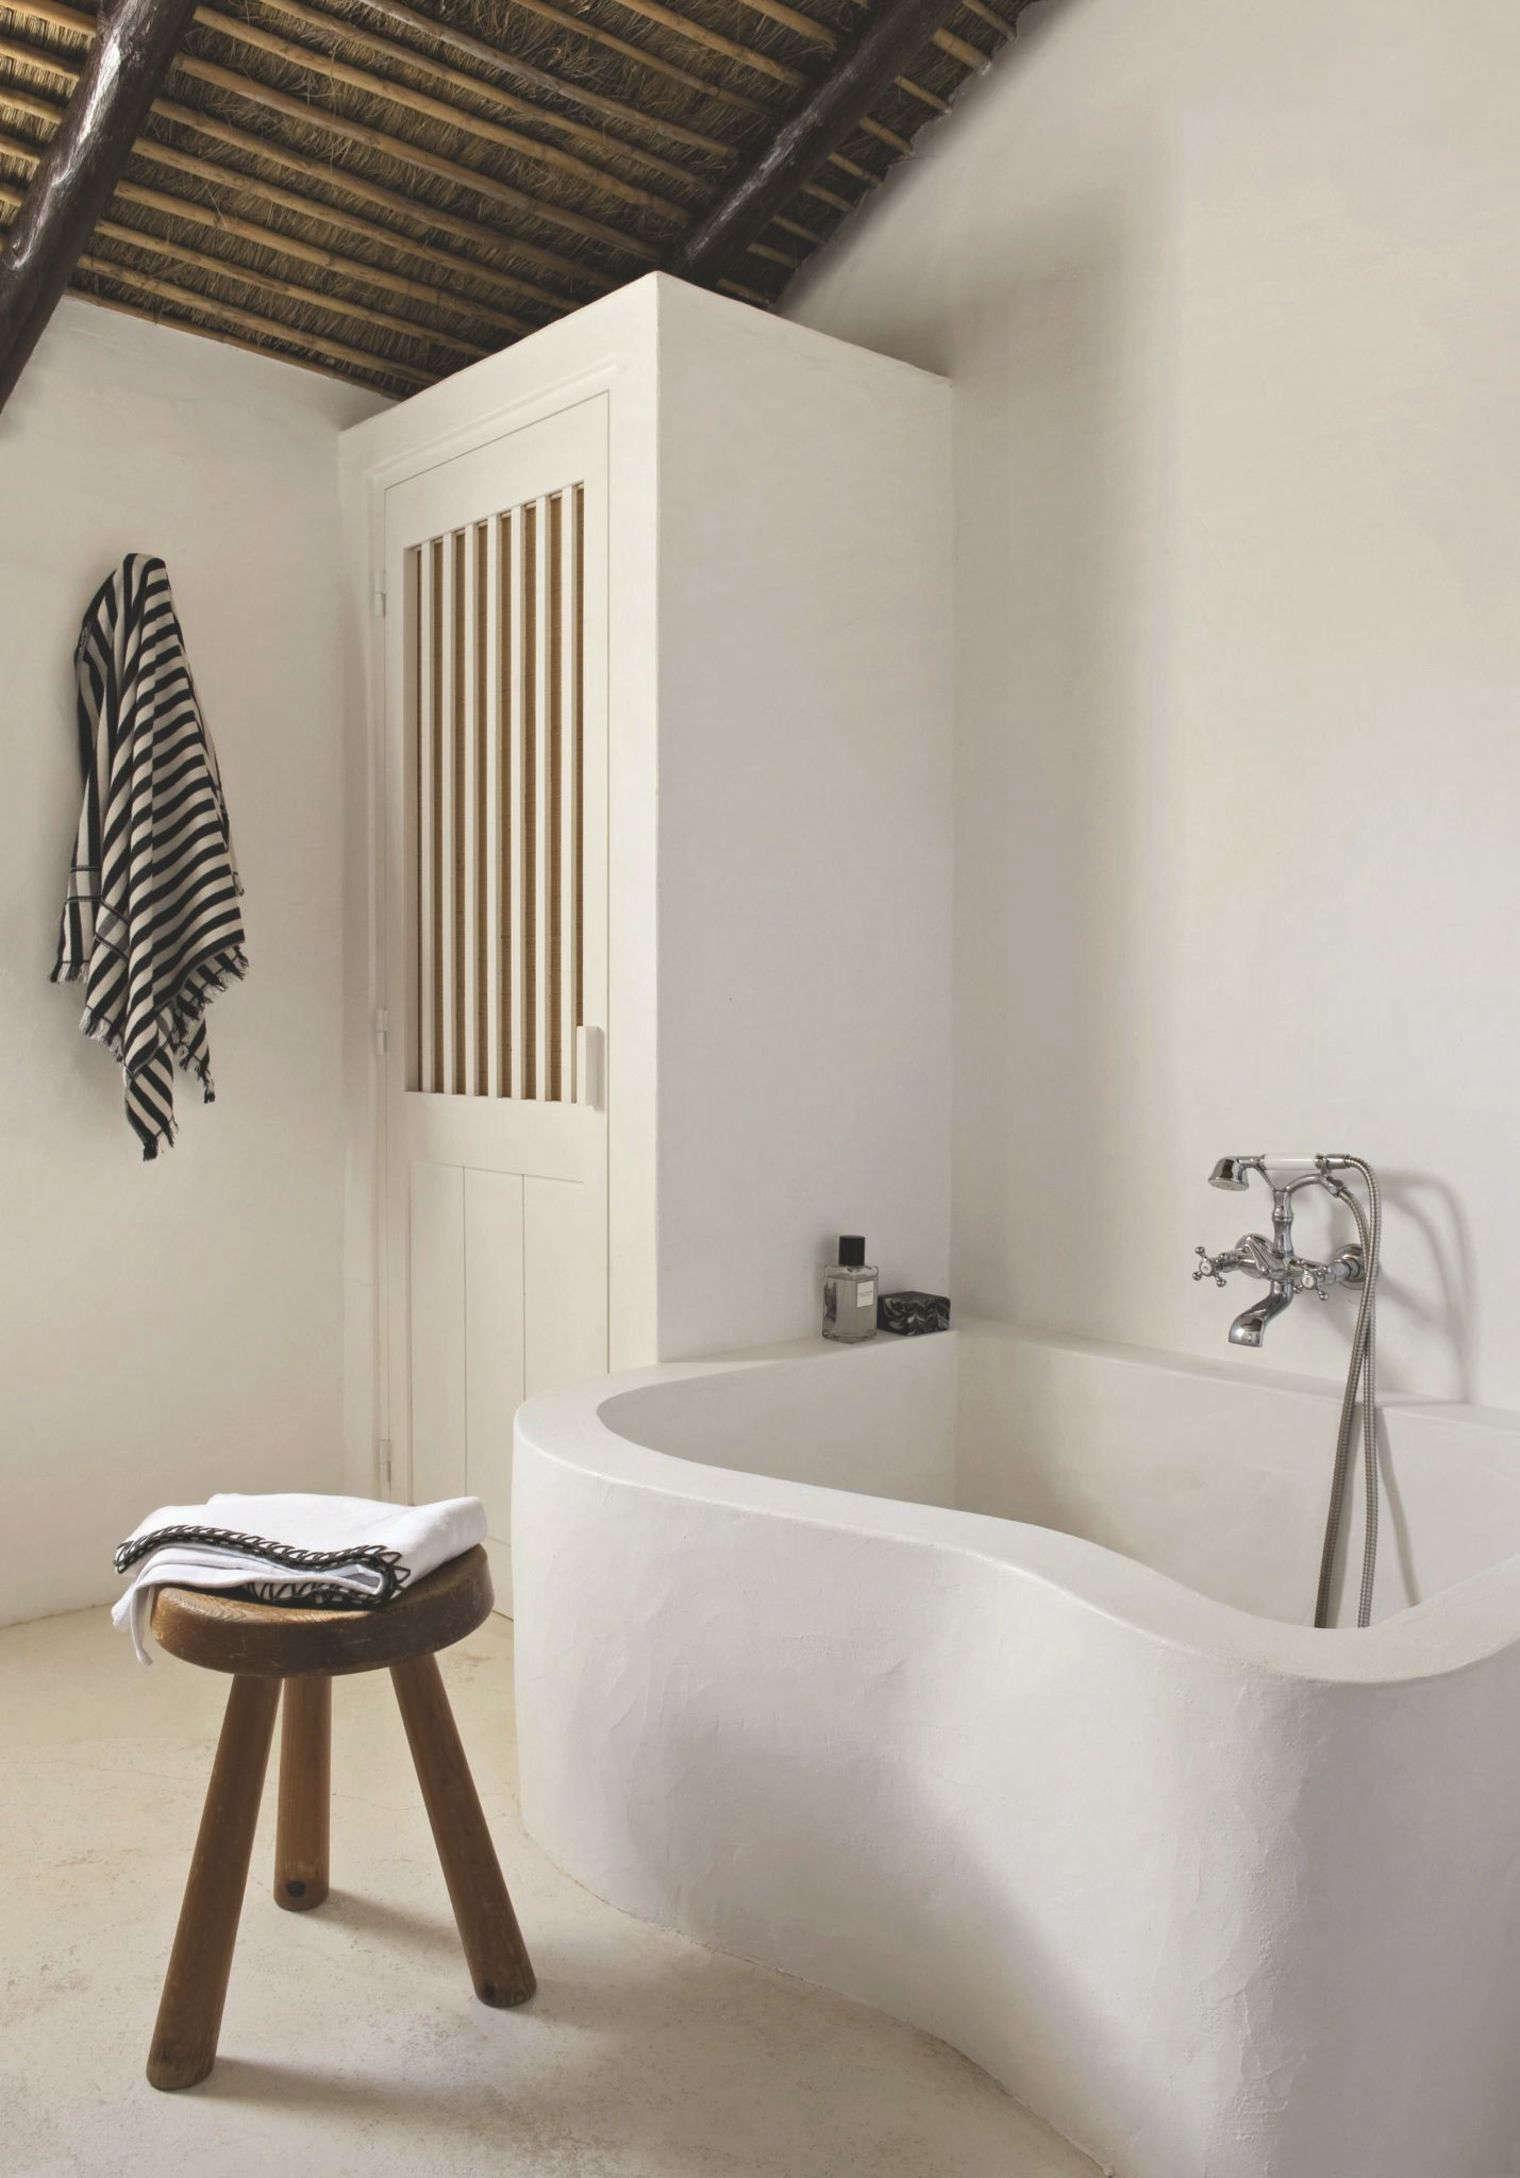 Trend Alert: 13 Sculptural Baths and Showers - Remodelista